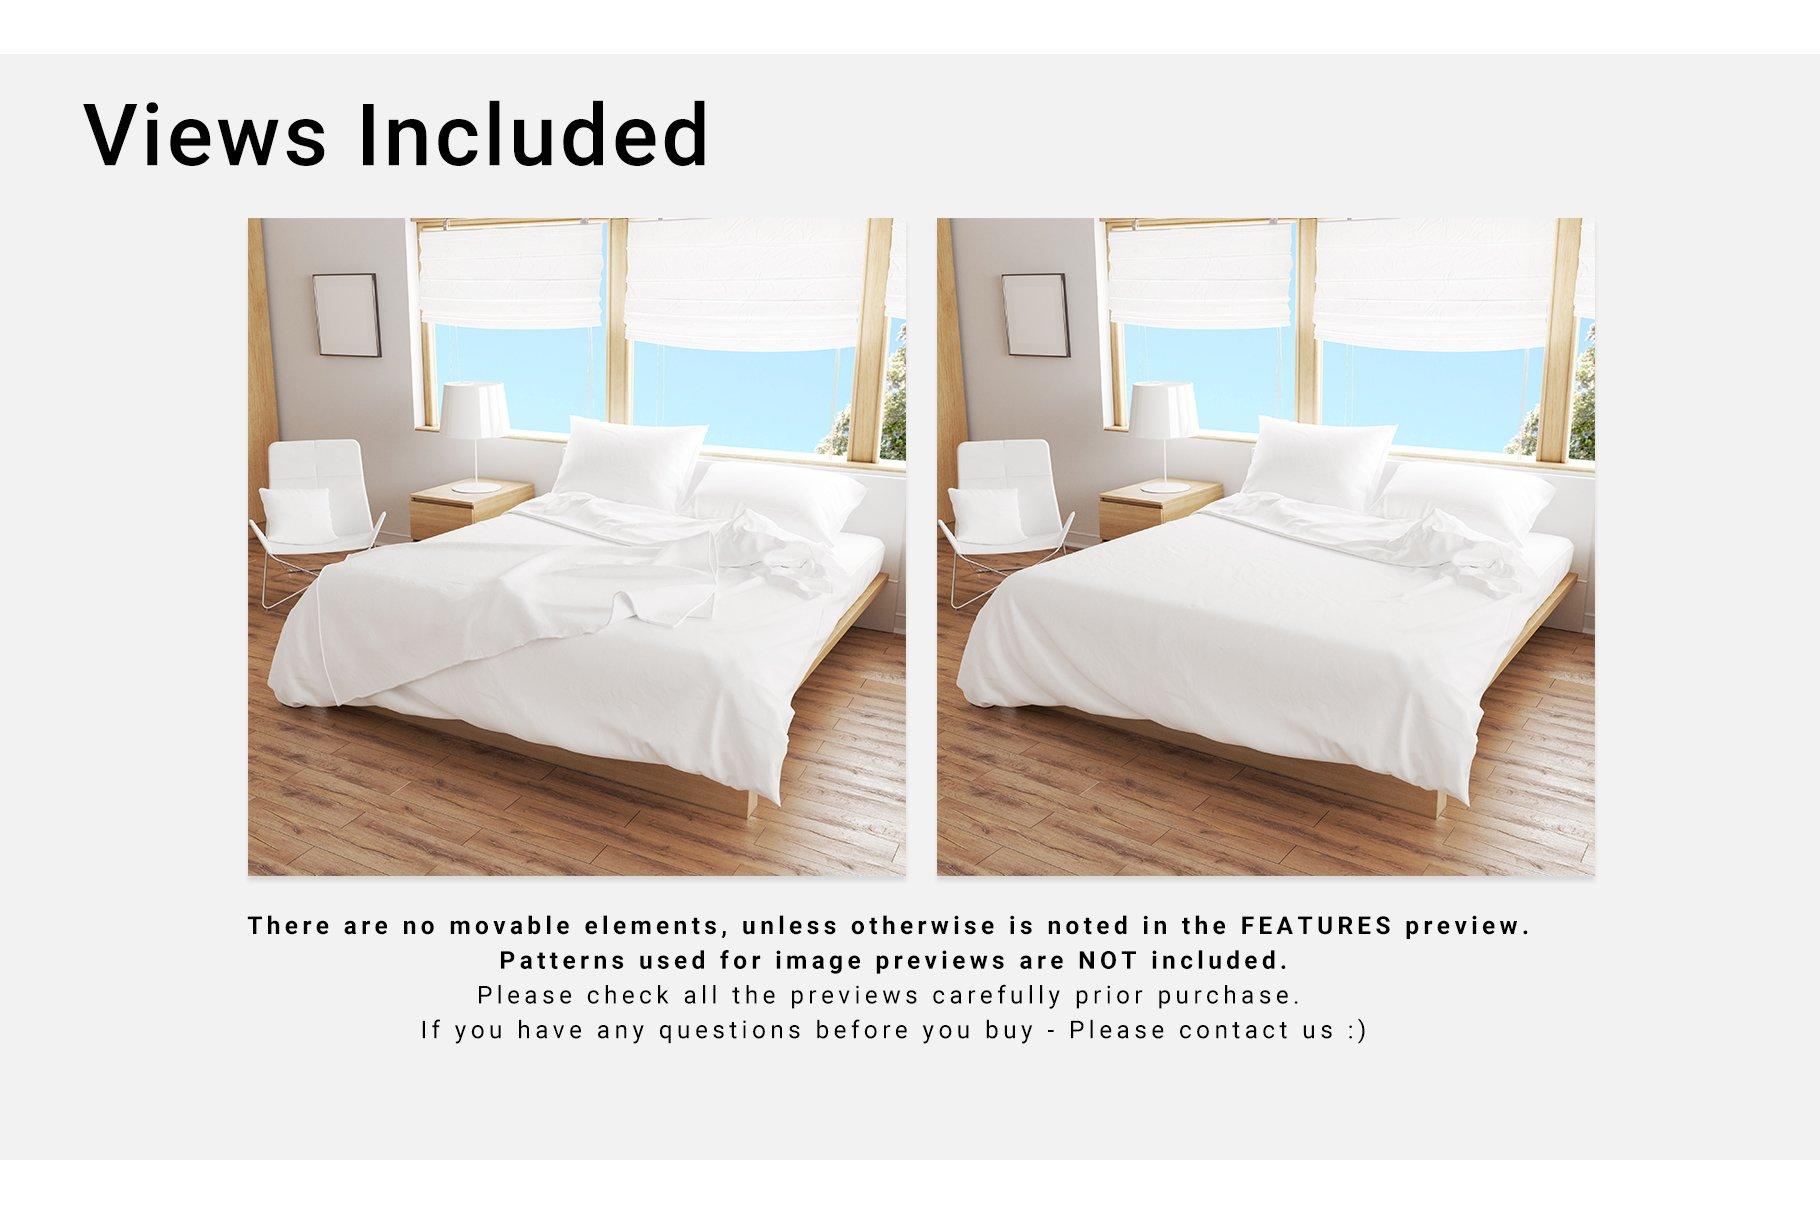 Bedroom Set - Bedding & Throw Pillow example image 3